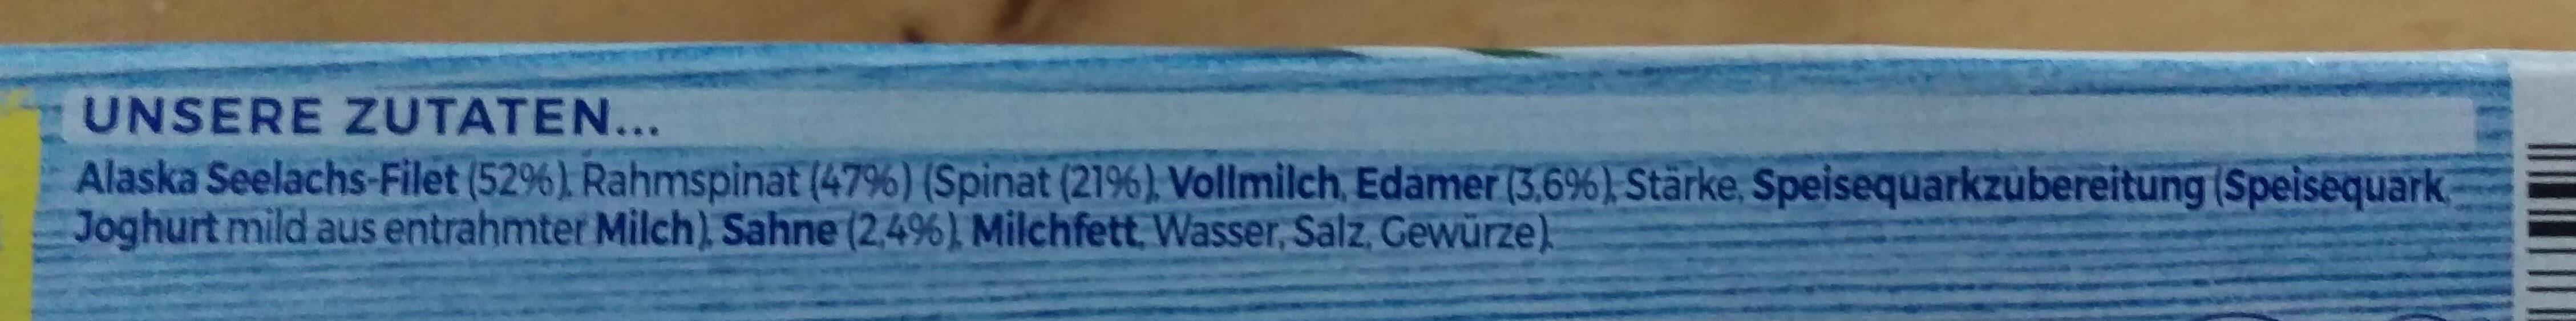 Schlemmer-Filet Rahmspinat - Der mit dem Blubb - Ingrédients - de